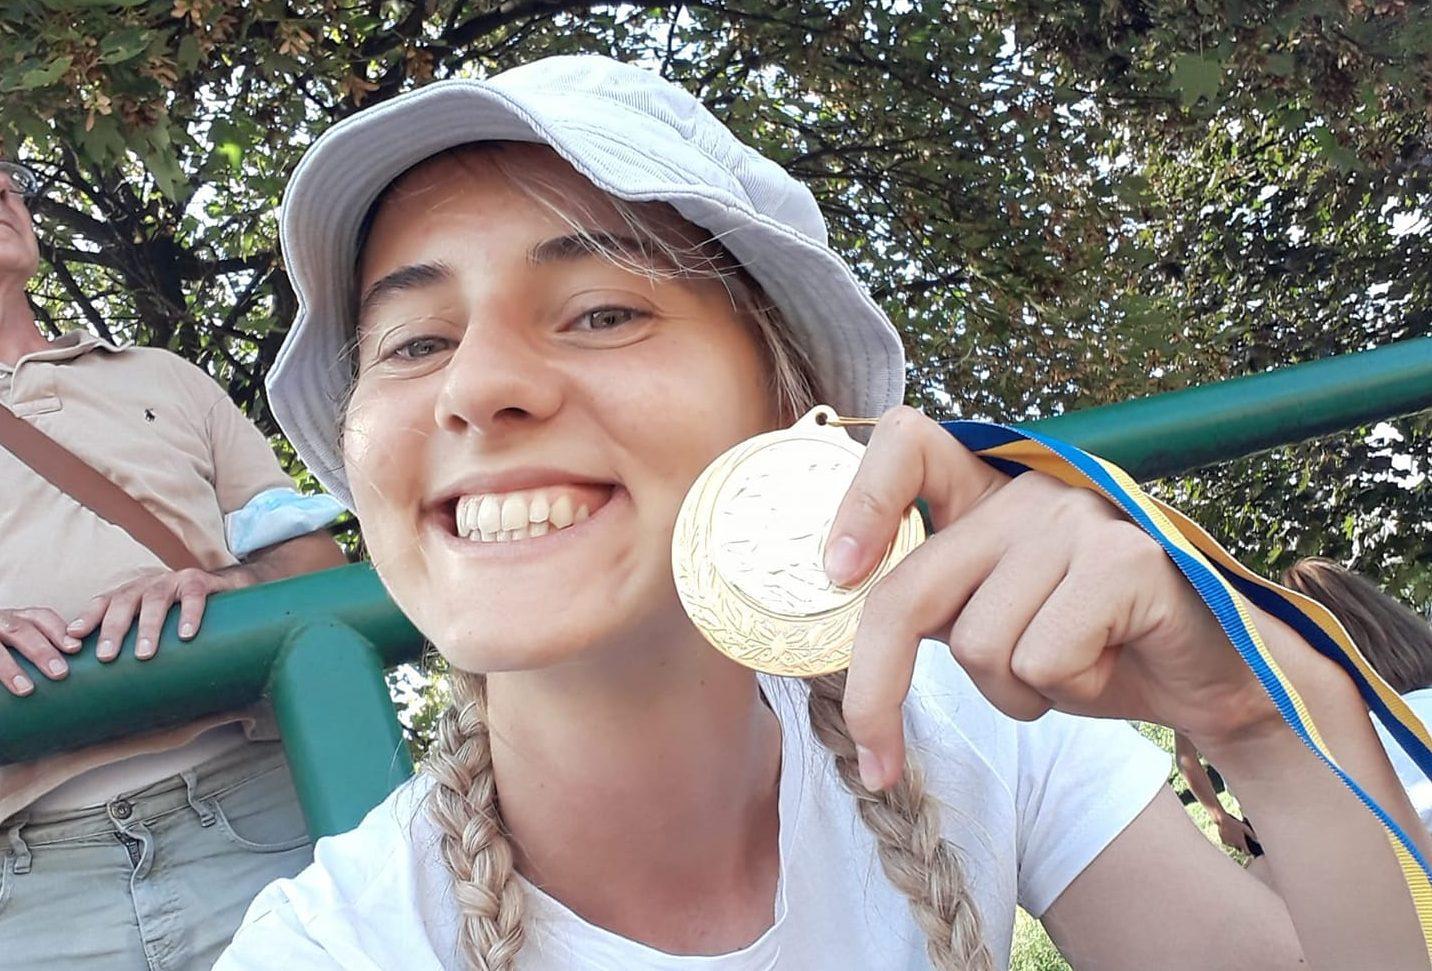 Nudžejma Šupuk ZLATNA na državnom prvenstvu iz atletike